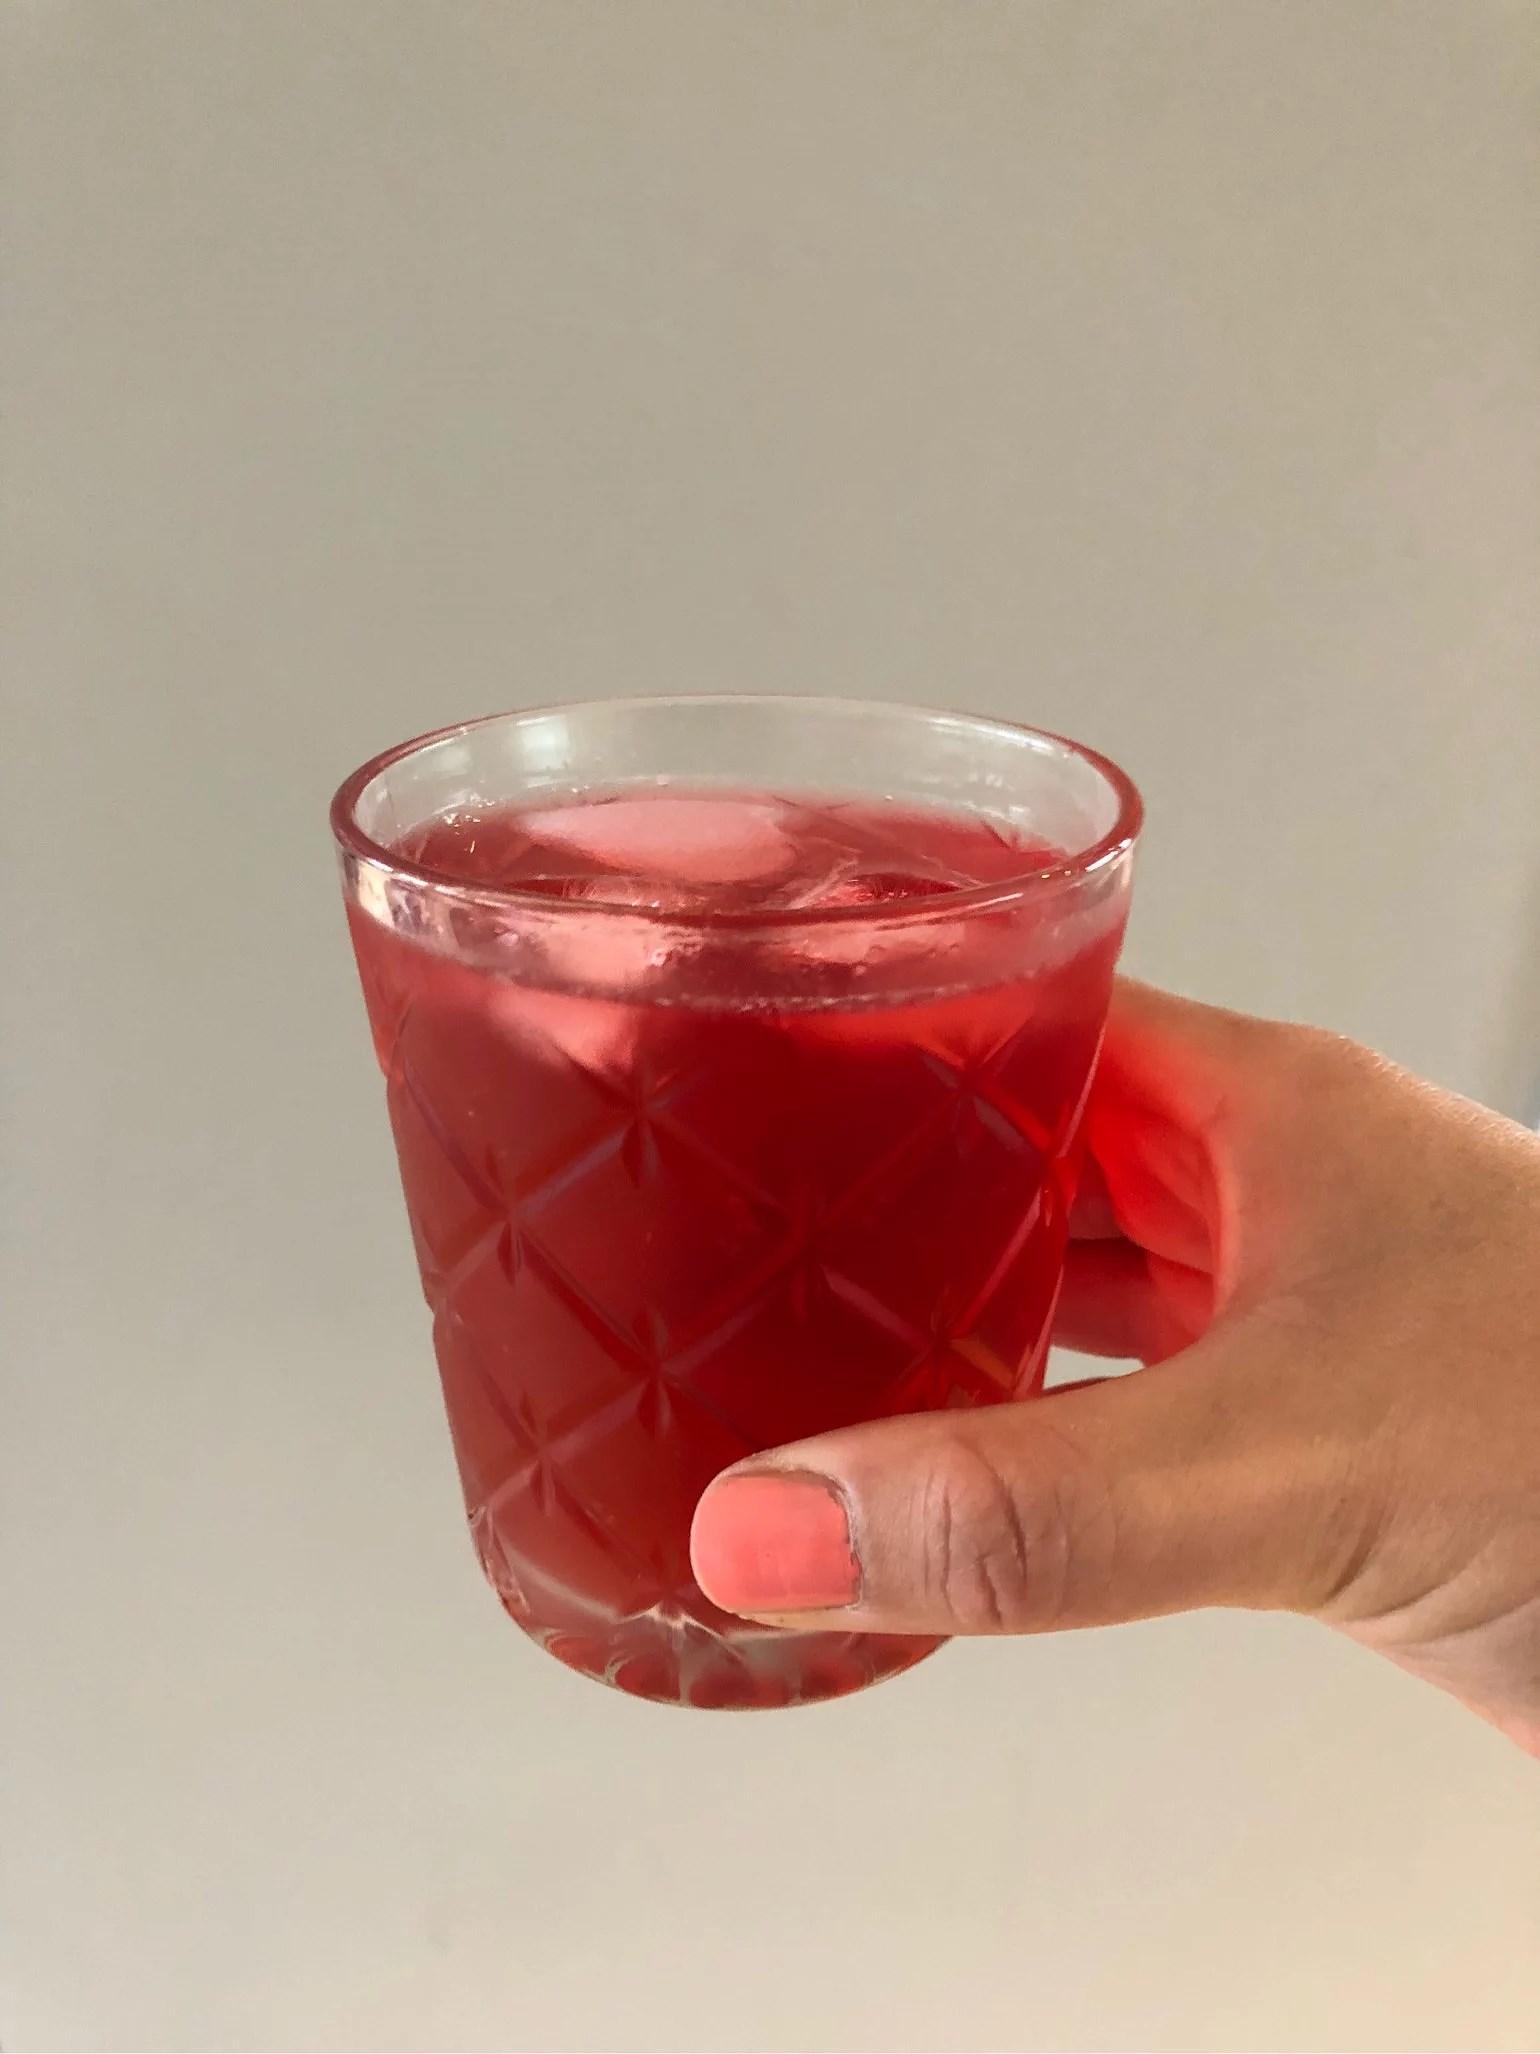 Dagens drink. 🍹